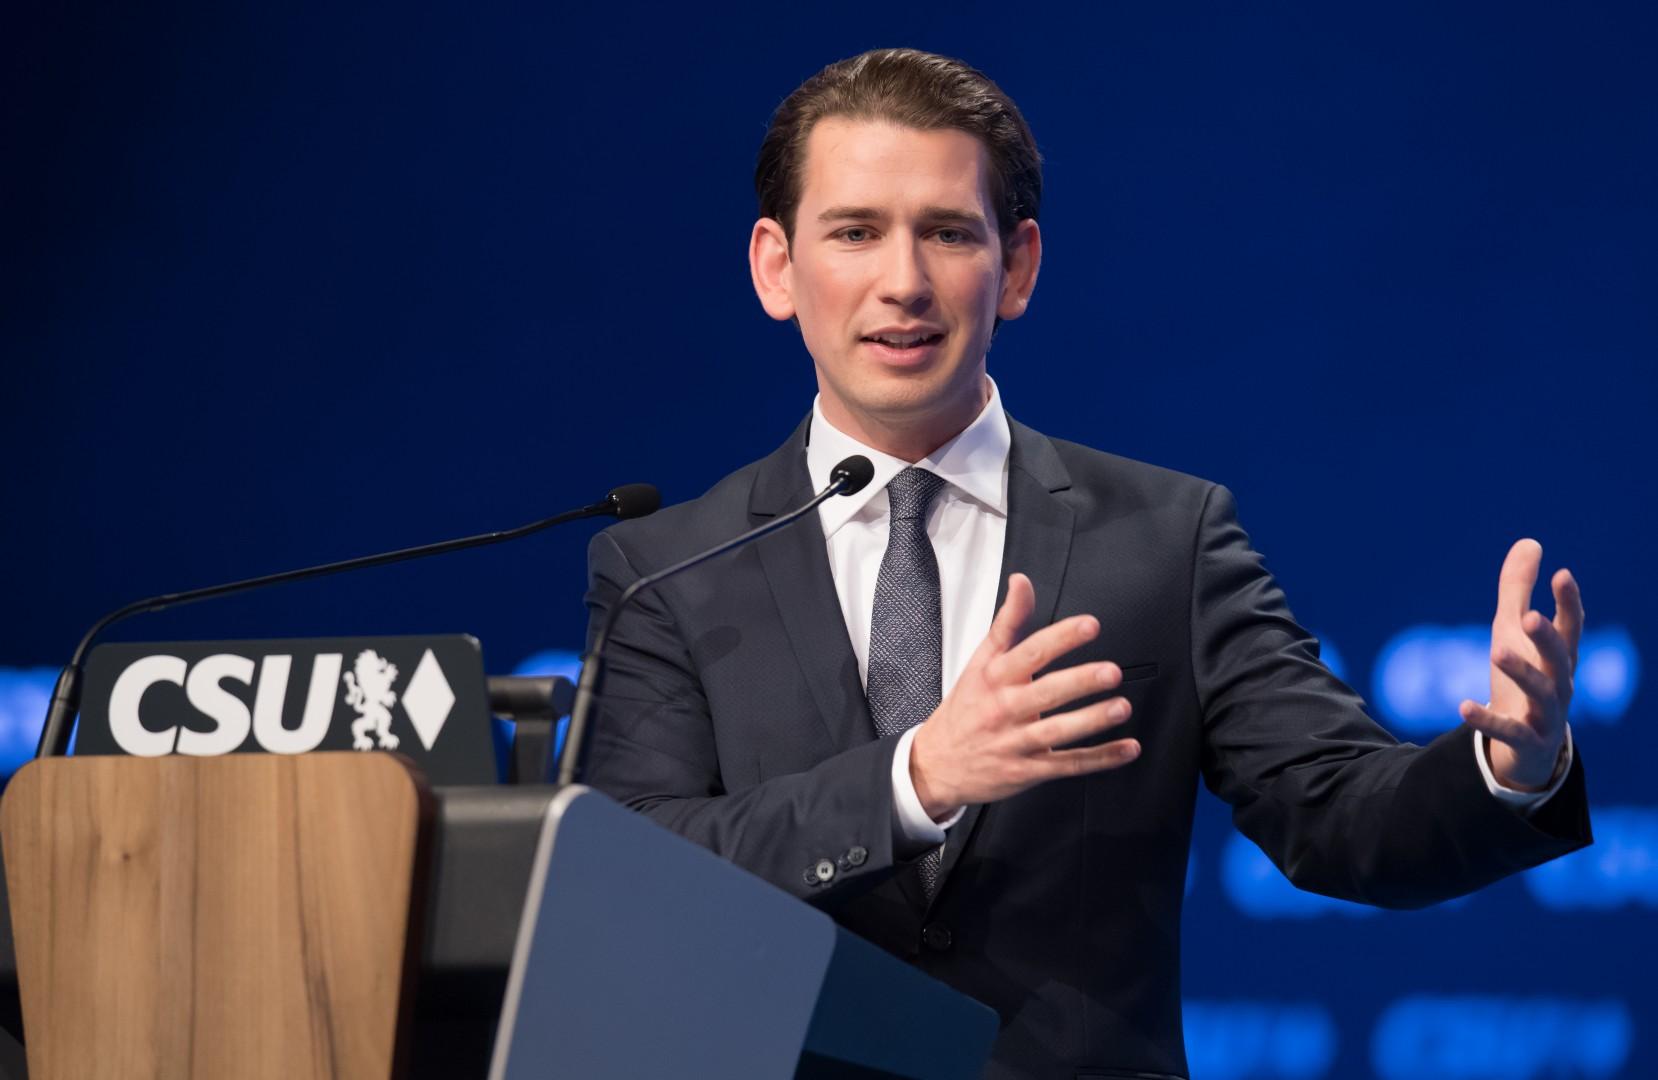 Kongresa CSU se je udeležil tudi avstrijski zunanji minister Sebastian Kurz (foto: epa)